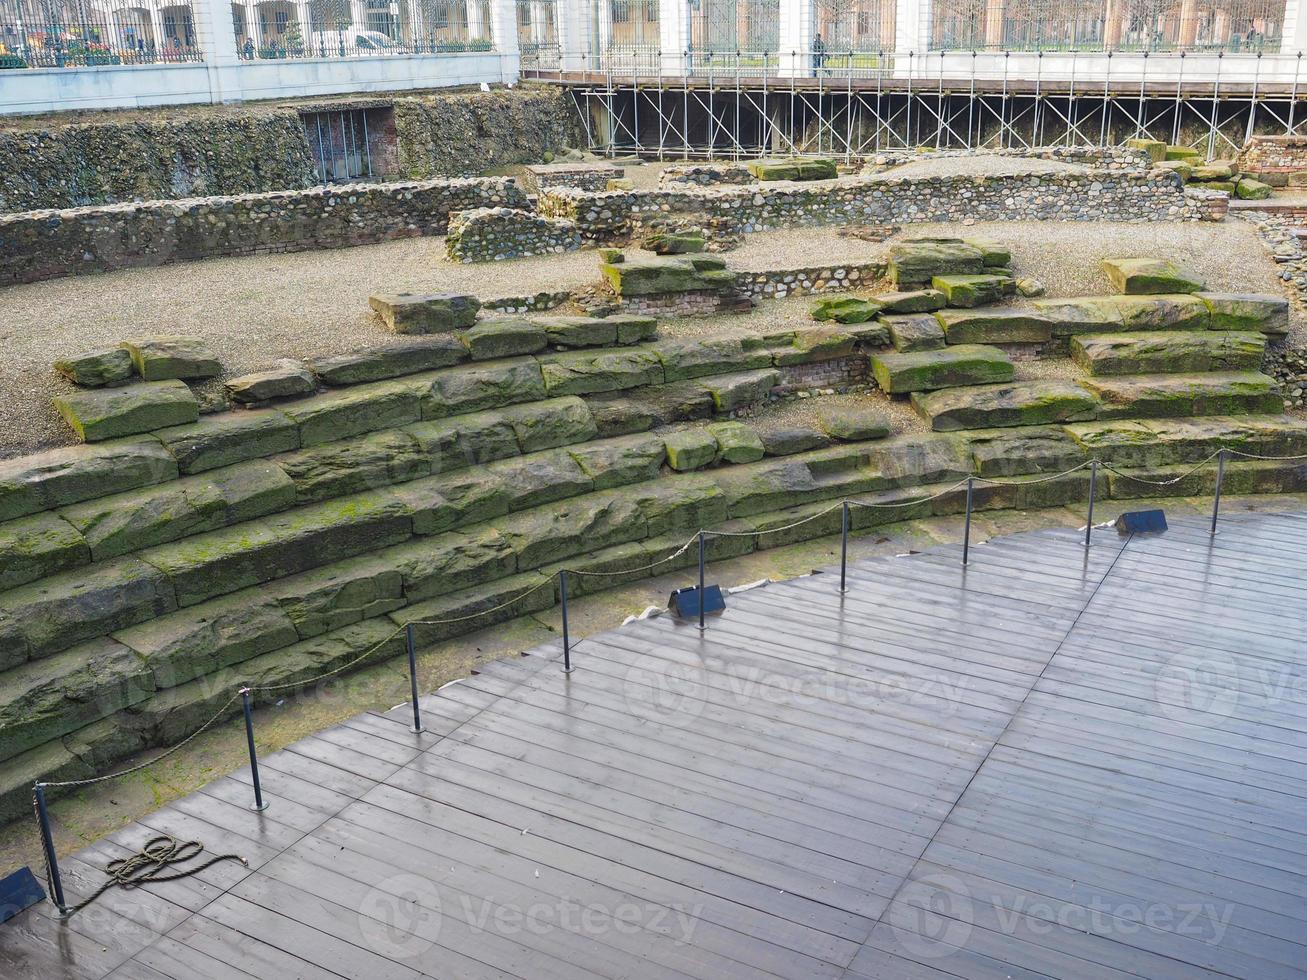 Théâtre romain de Turin photo